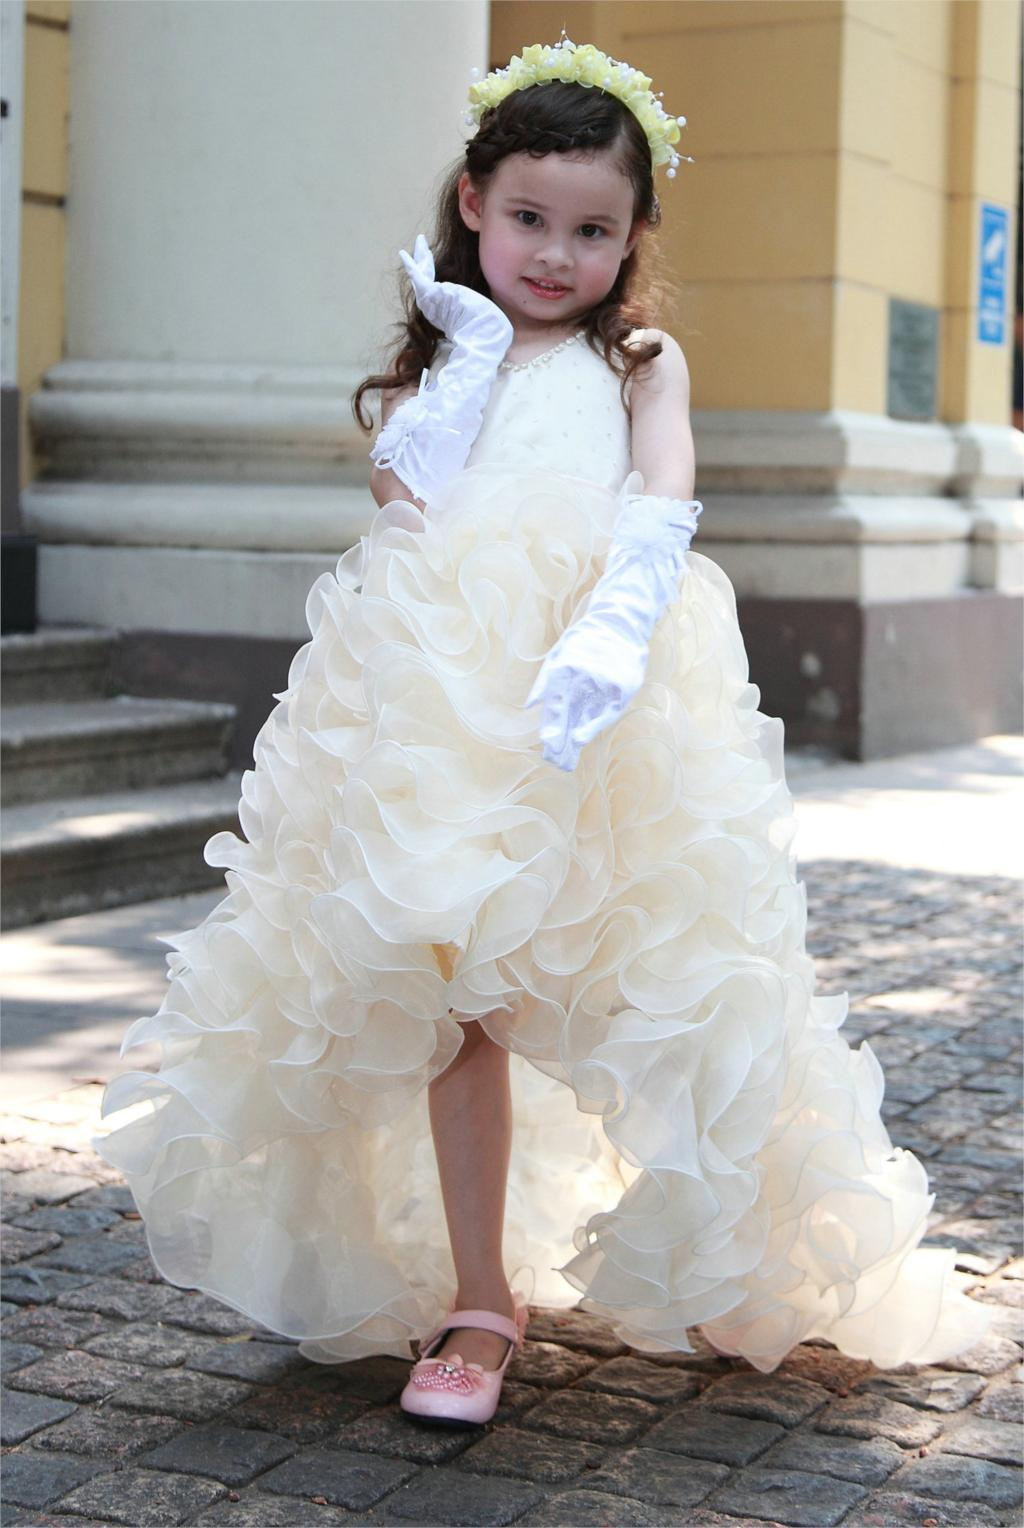 kids dresses for girls Long dovetail mop Girls wedding dress princess tutu dresses children clothing 0132<br><br>Aliexpress